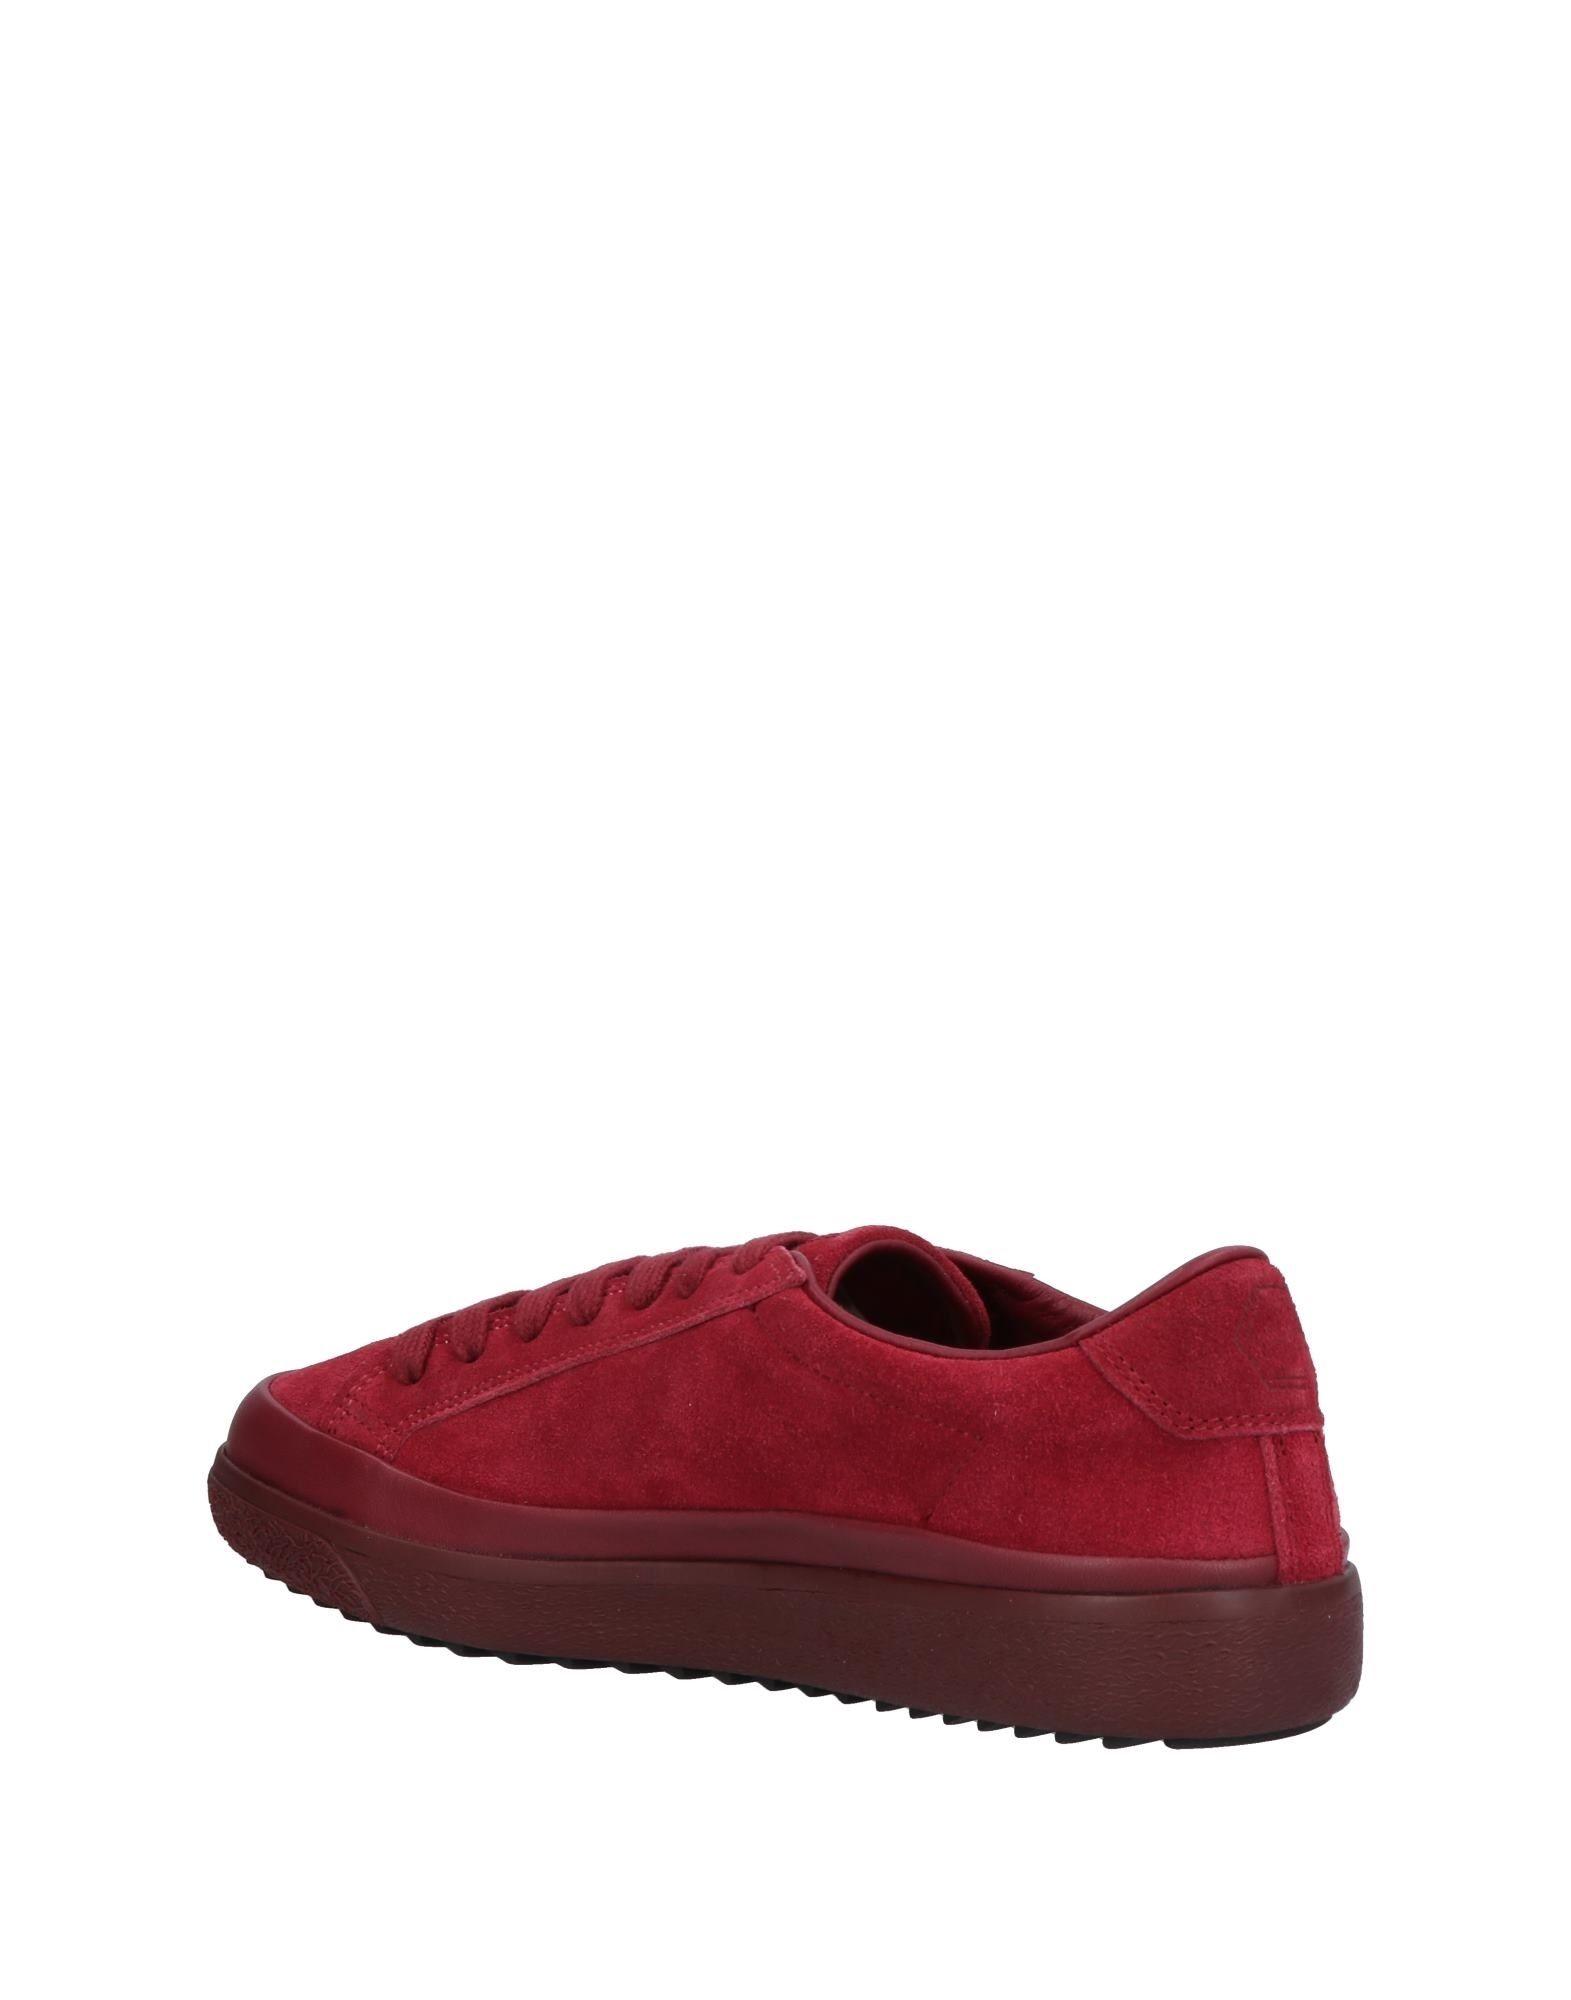 Sneakers Pantofola Doro Femme - Sneakers Pantofola Doro sur